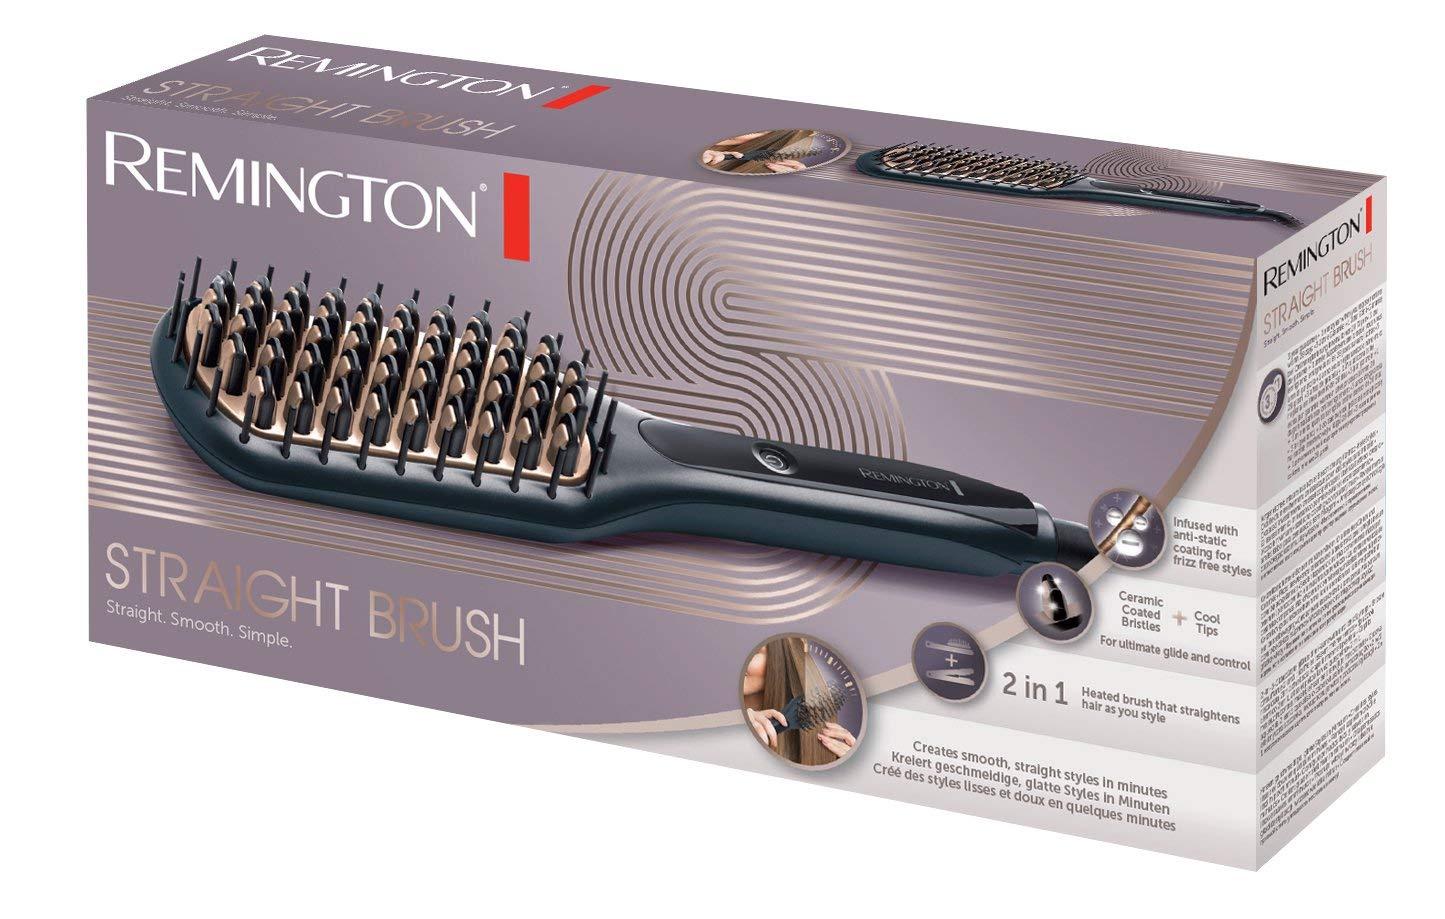 brosse chauffante lissante remington